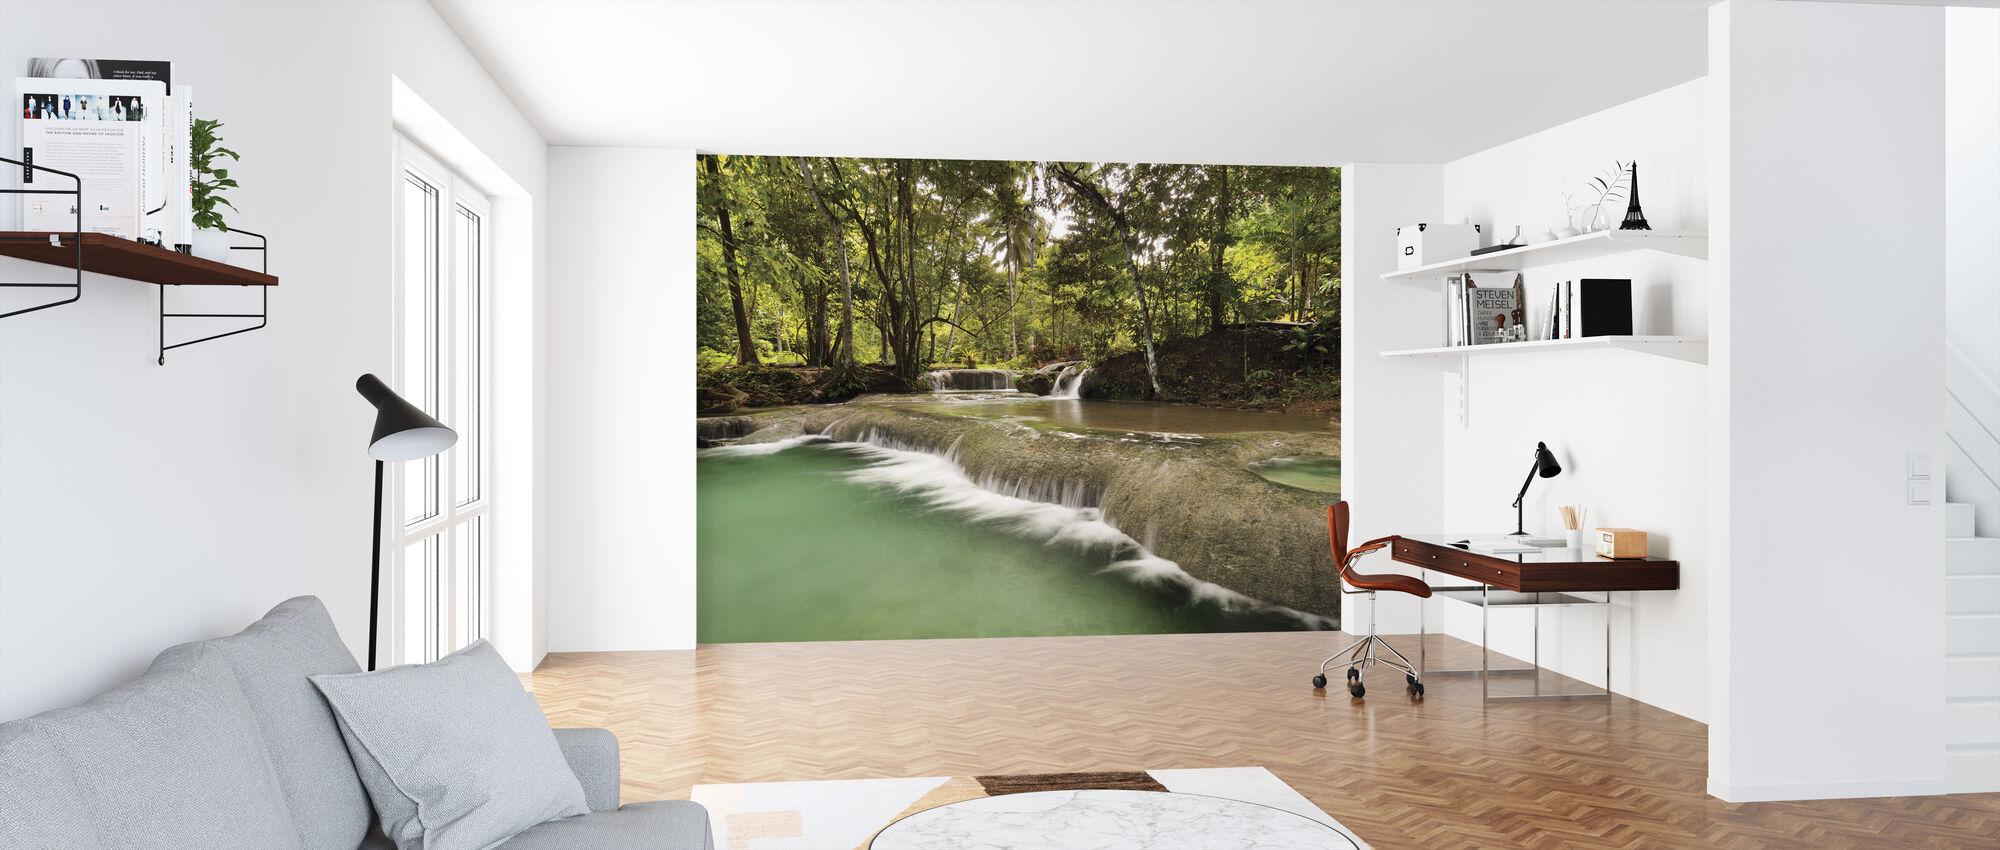 Cataratas Hagimit IV - Papel pintado - Oficina